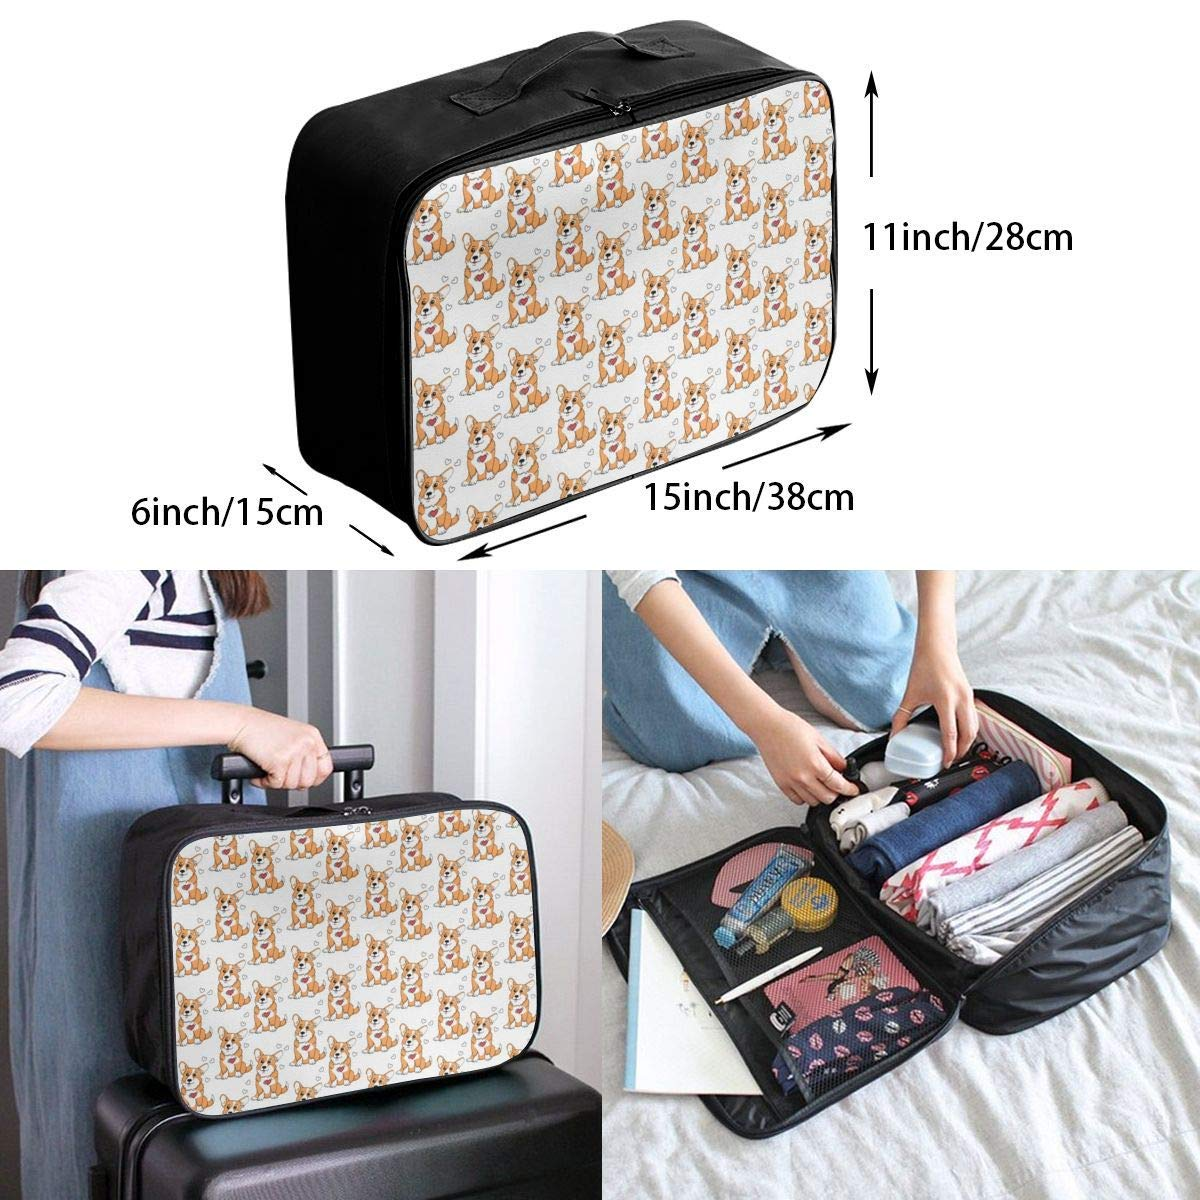 Corgis Funny Dog Design Travel Duffel Bag Waterproof Fashion Lightweight Large Capacity Portable Duffel Bag for Men /& Women JTRVW Luggage Bags for Travel